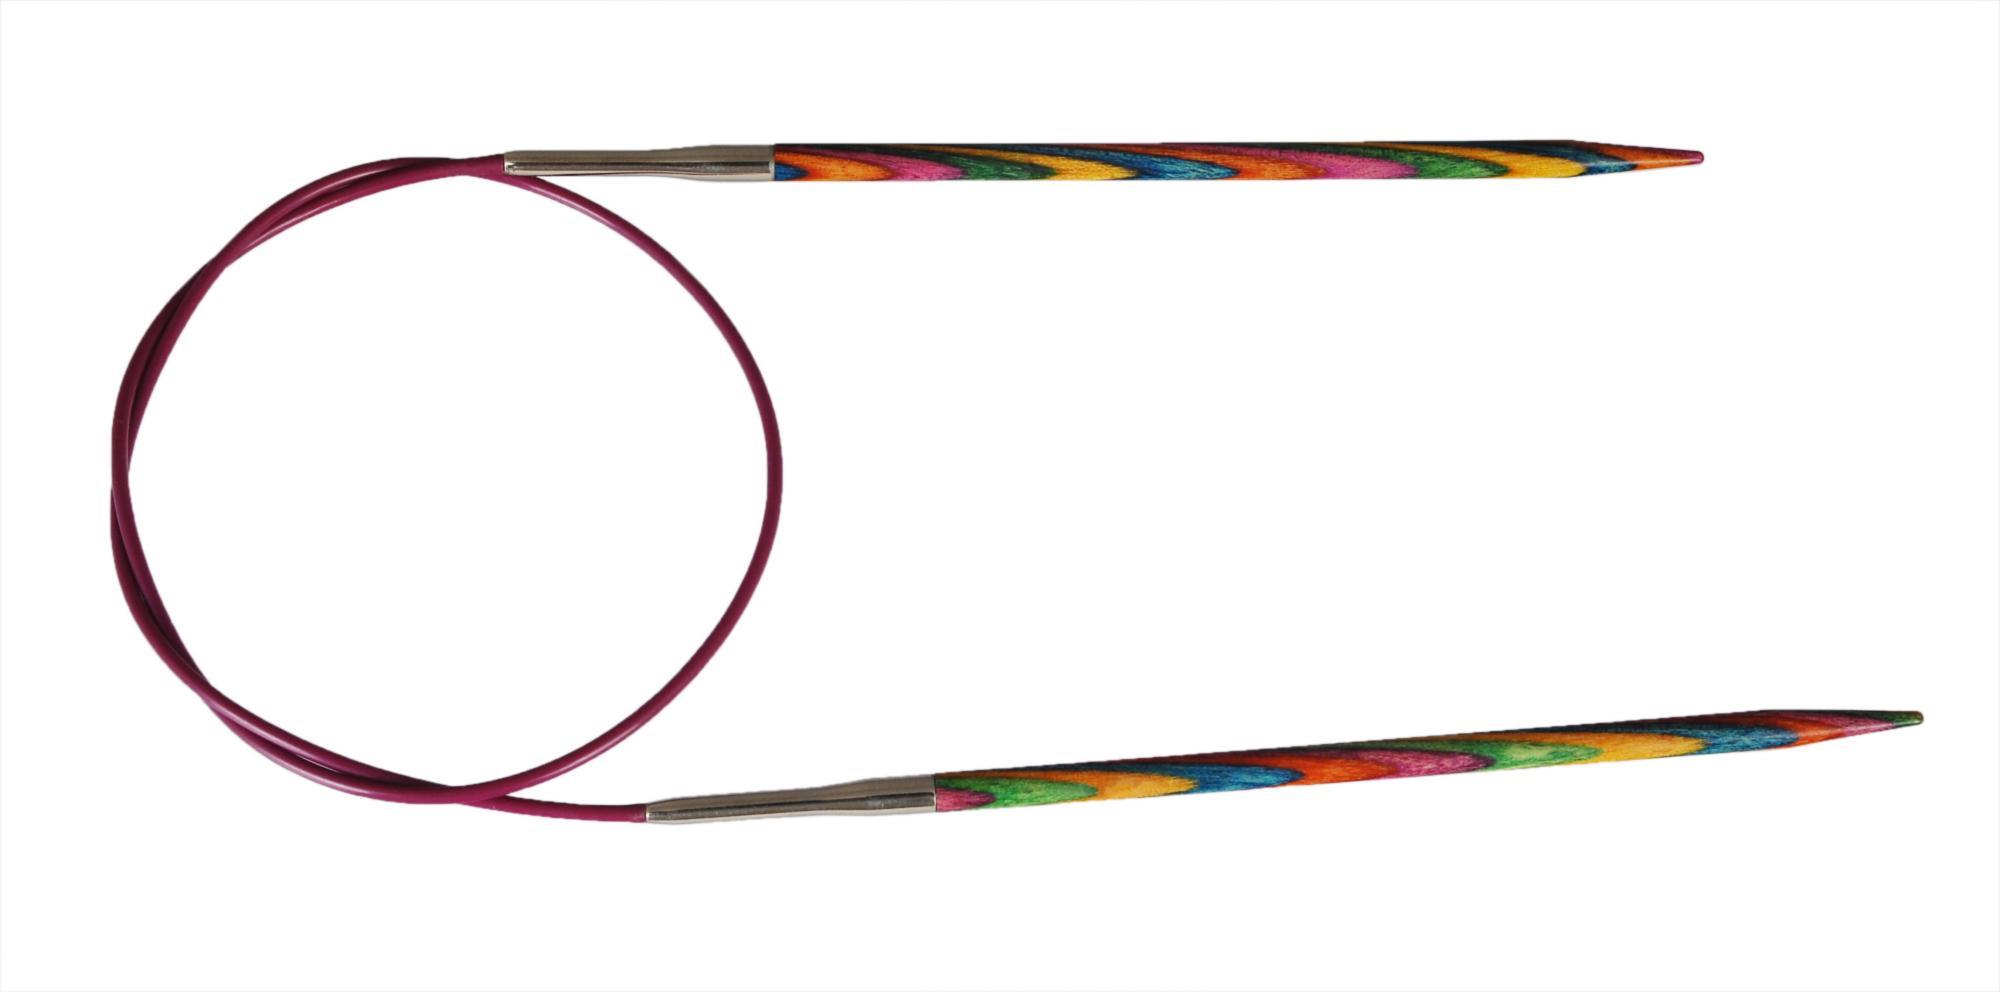 Спицы круговые 60 см Symfonie Wood KnitPro, 21321, 3.75 мм